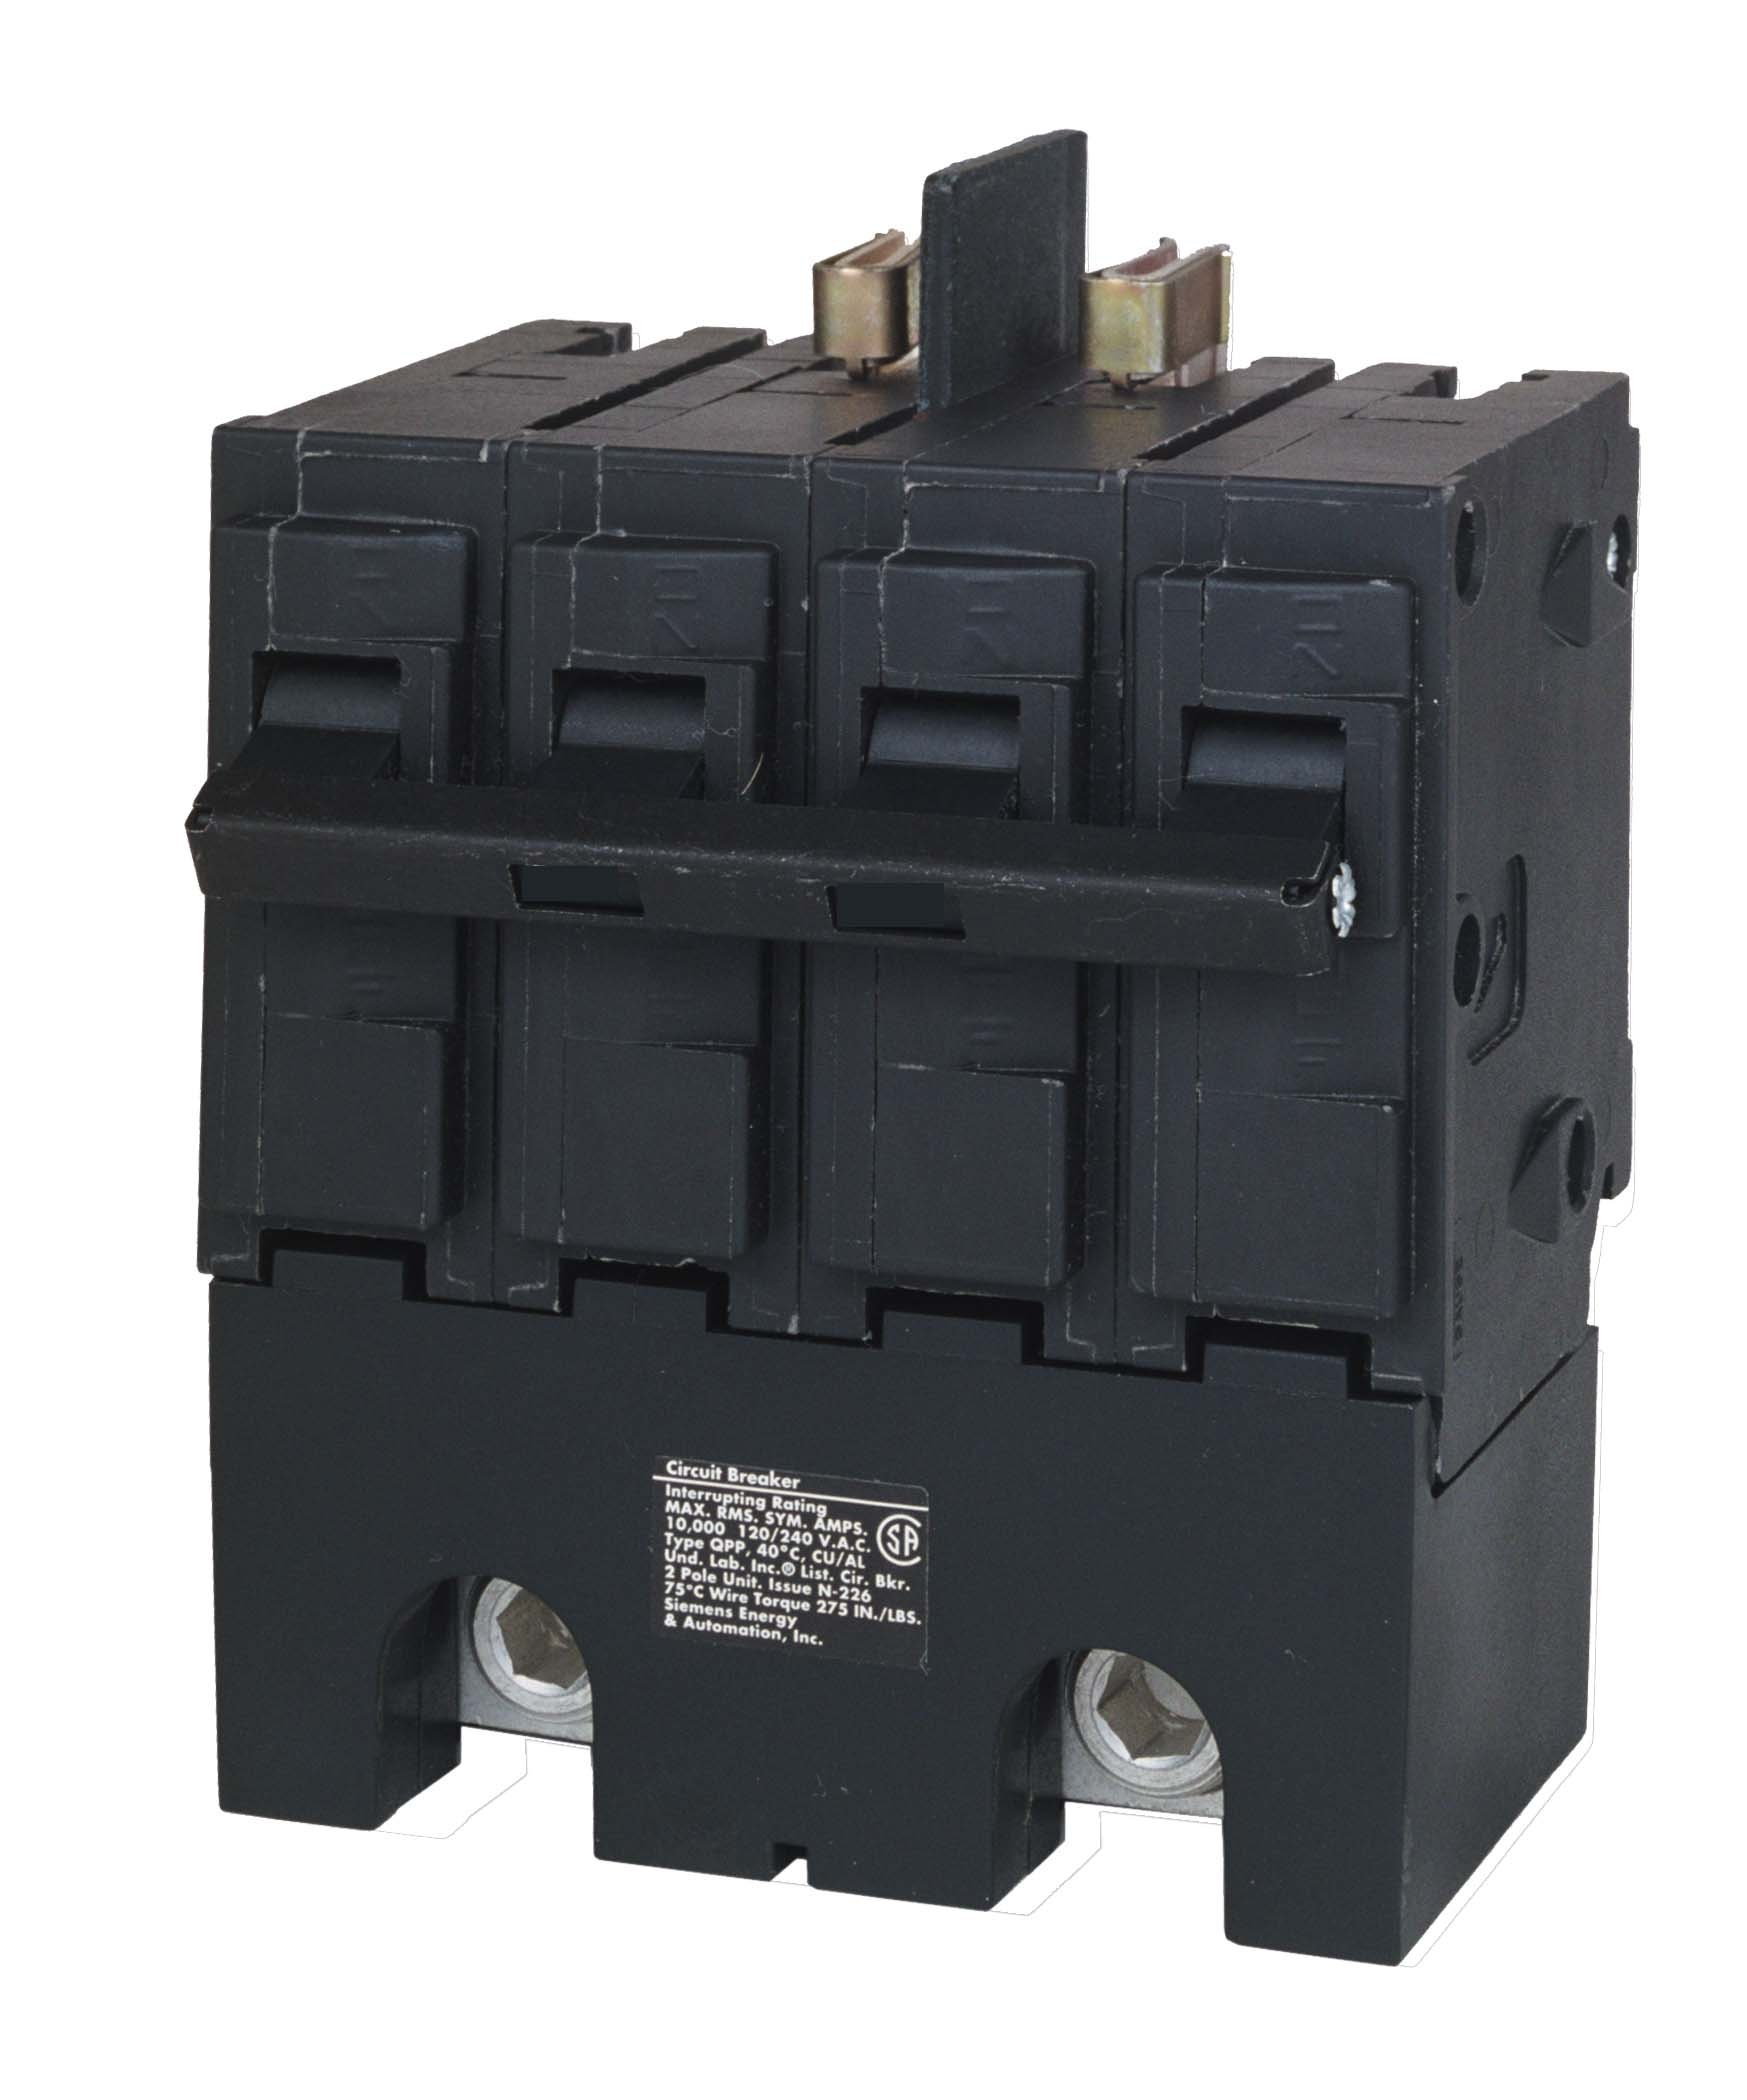 Siemens Q2150B 150A 4 Pole 120/240-Volt 10K type QPP Circuit Breaker by SIEMENS